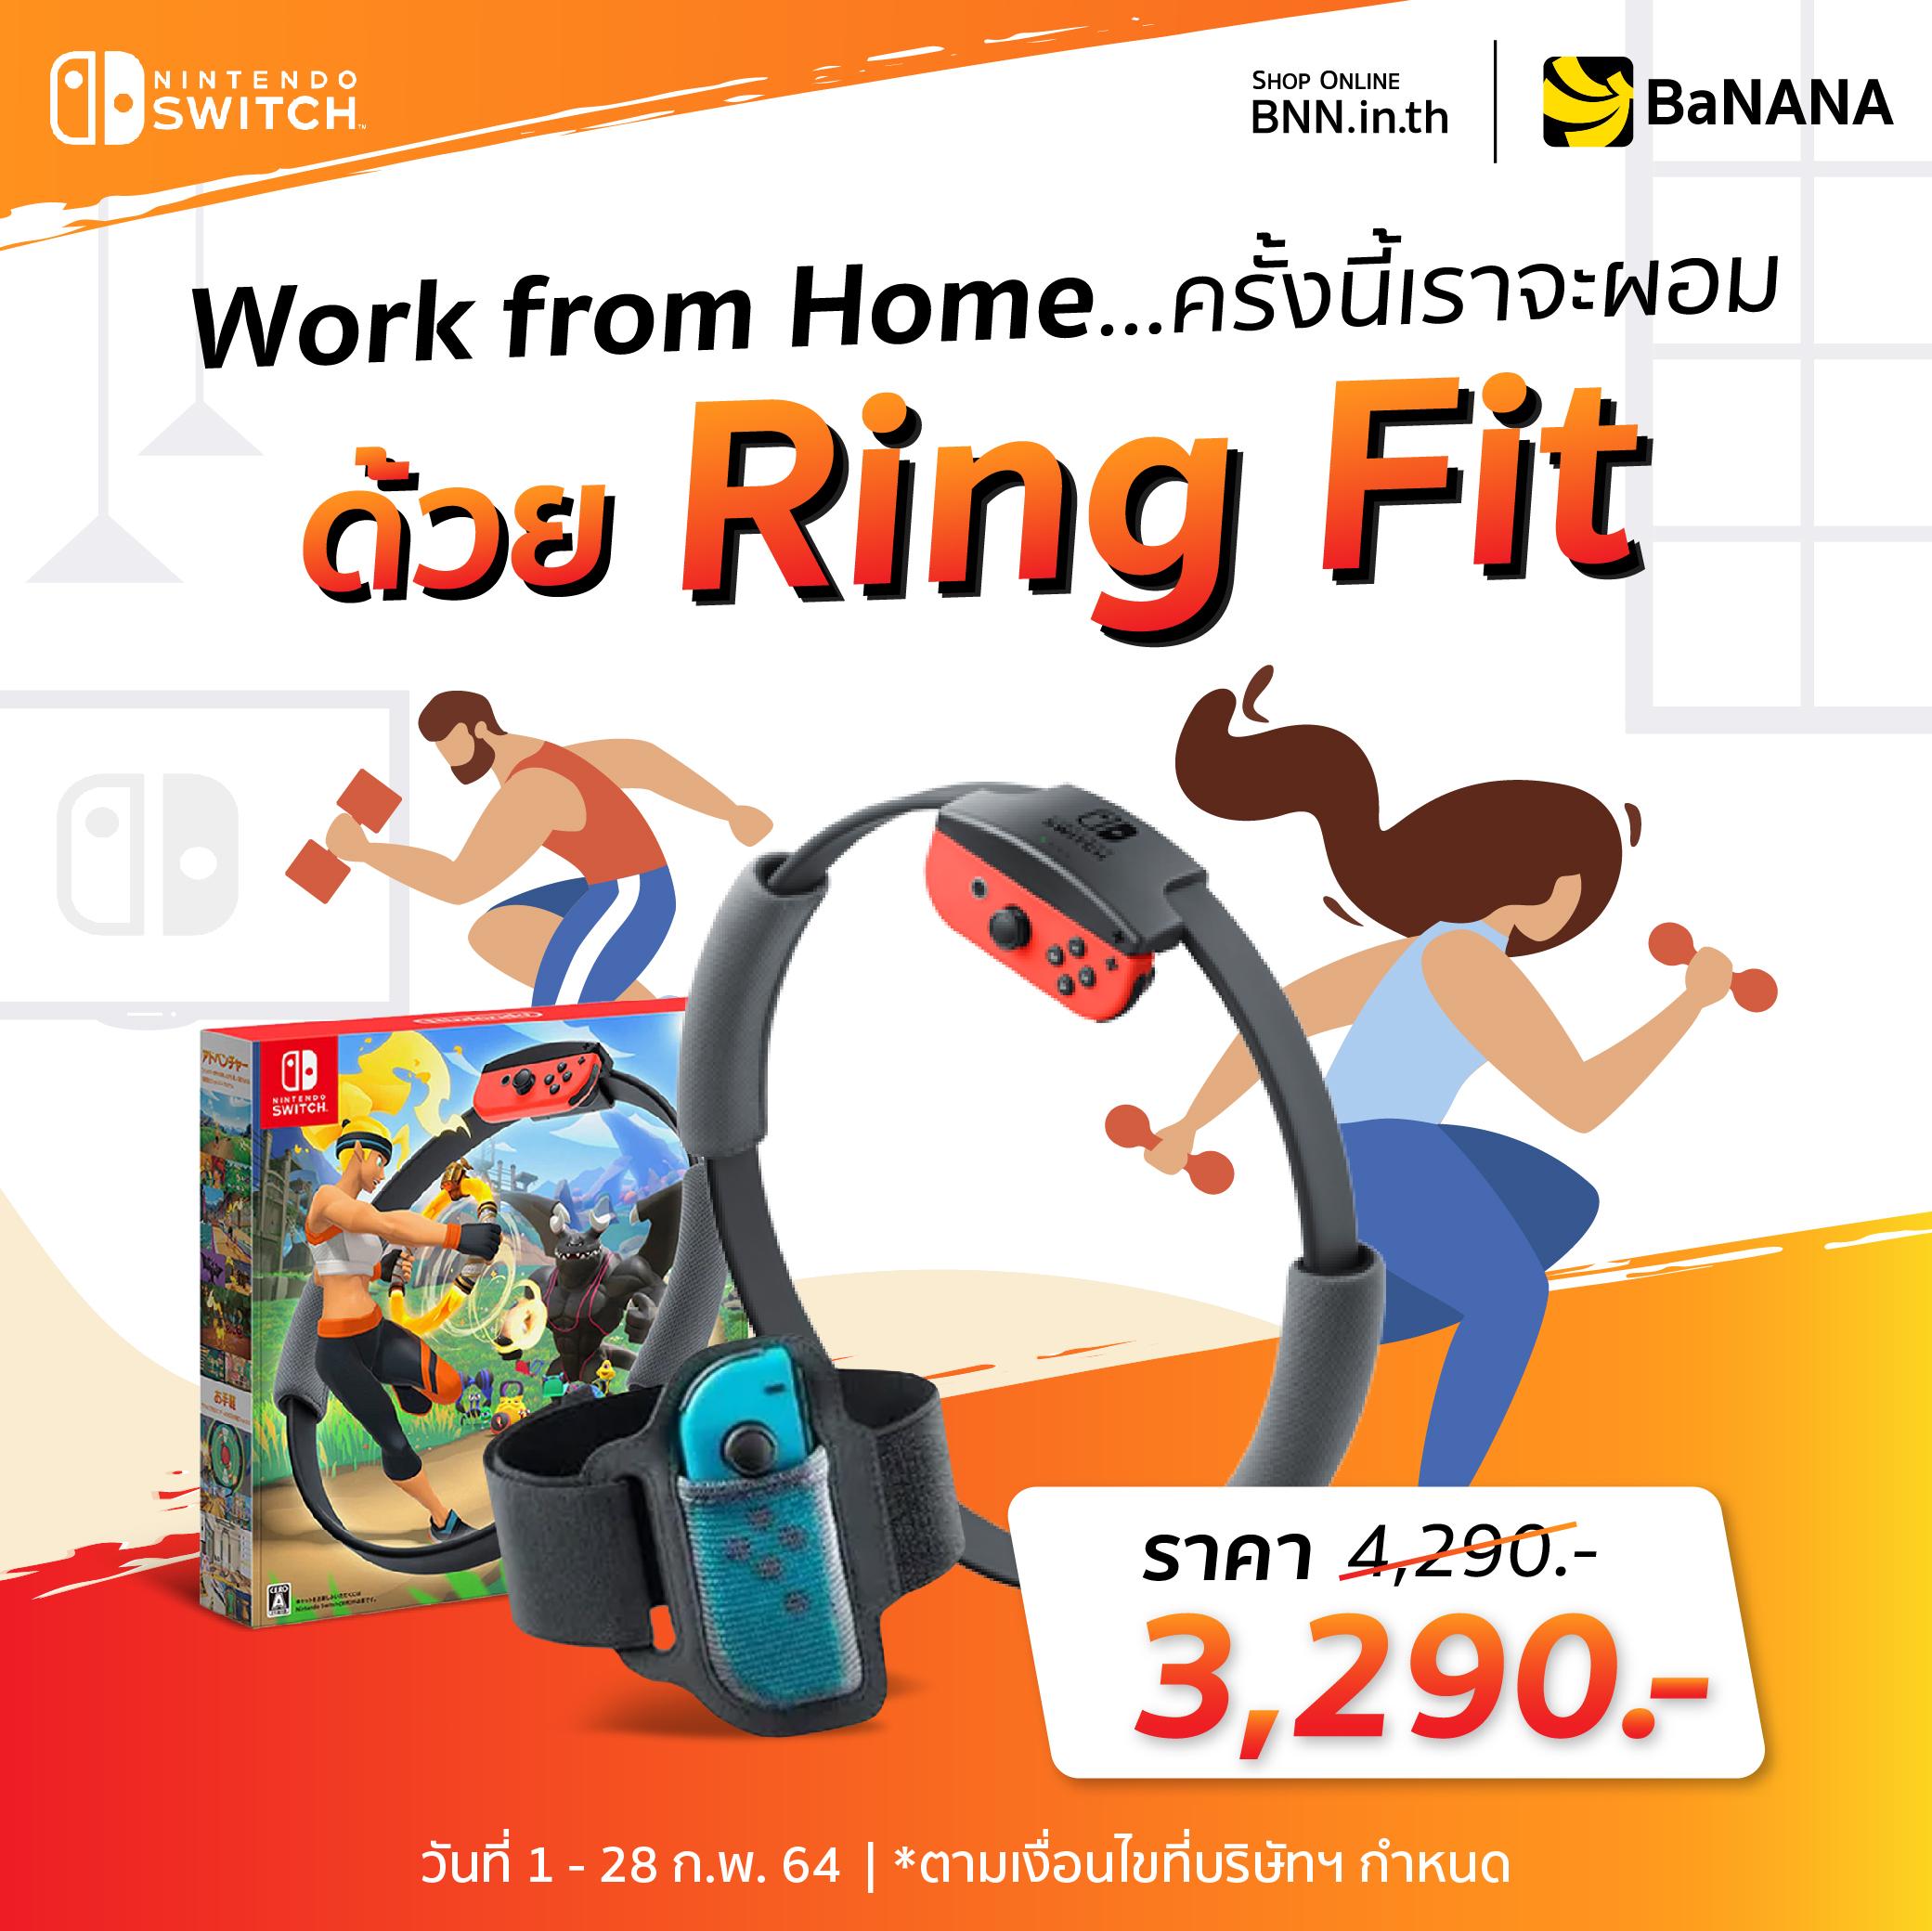 bnn.in.th - Ring Fit Adventure ราคาพิเศษ 3,290.- [จากปกติ 4,290.-]